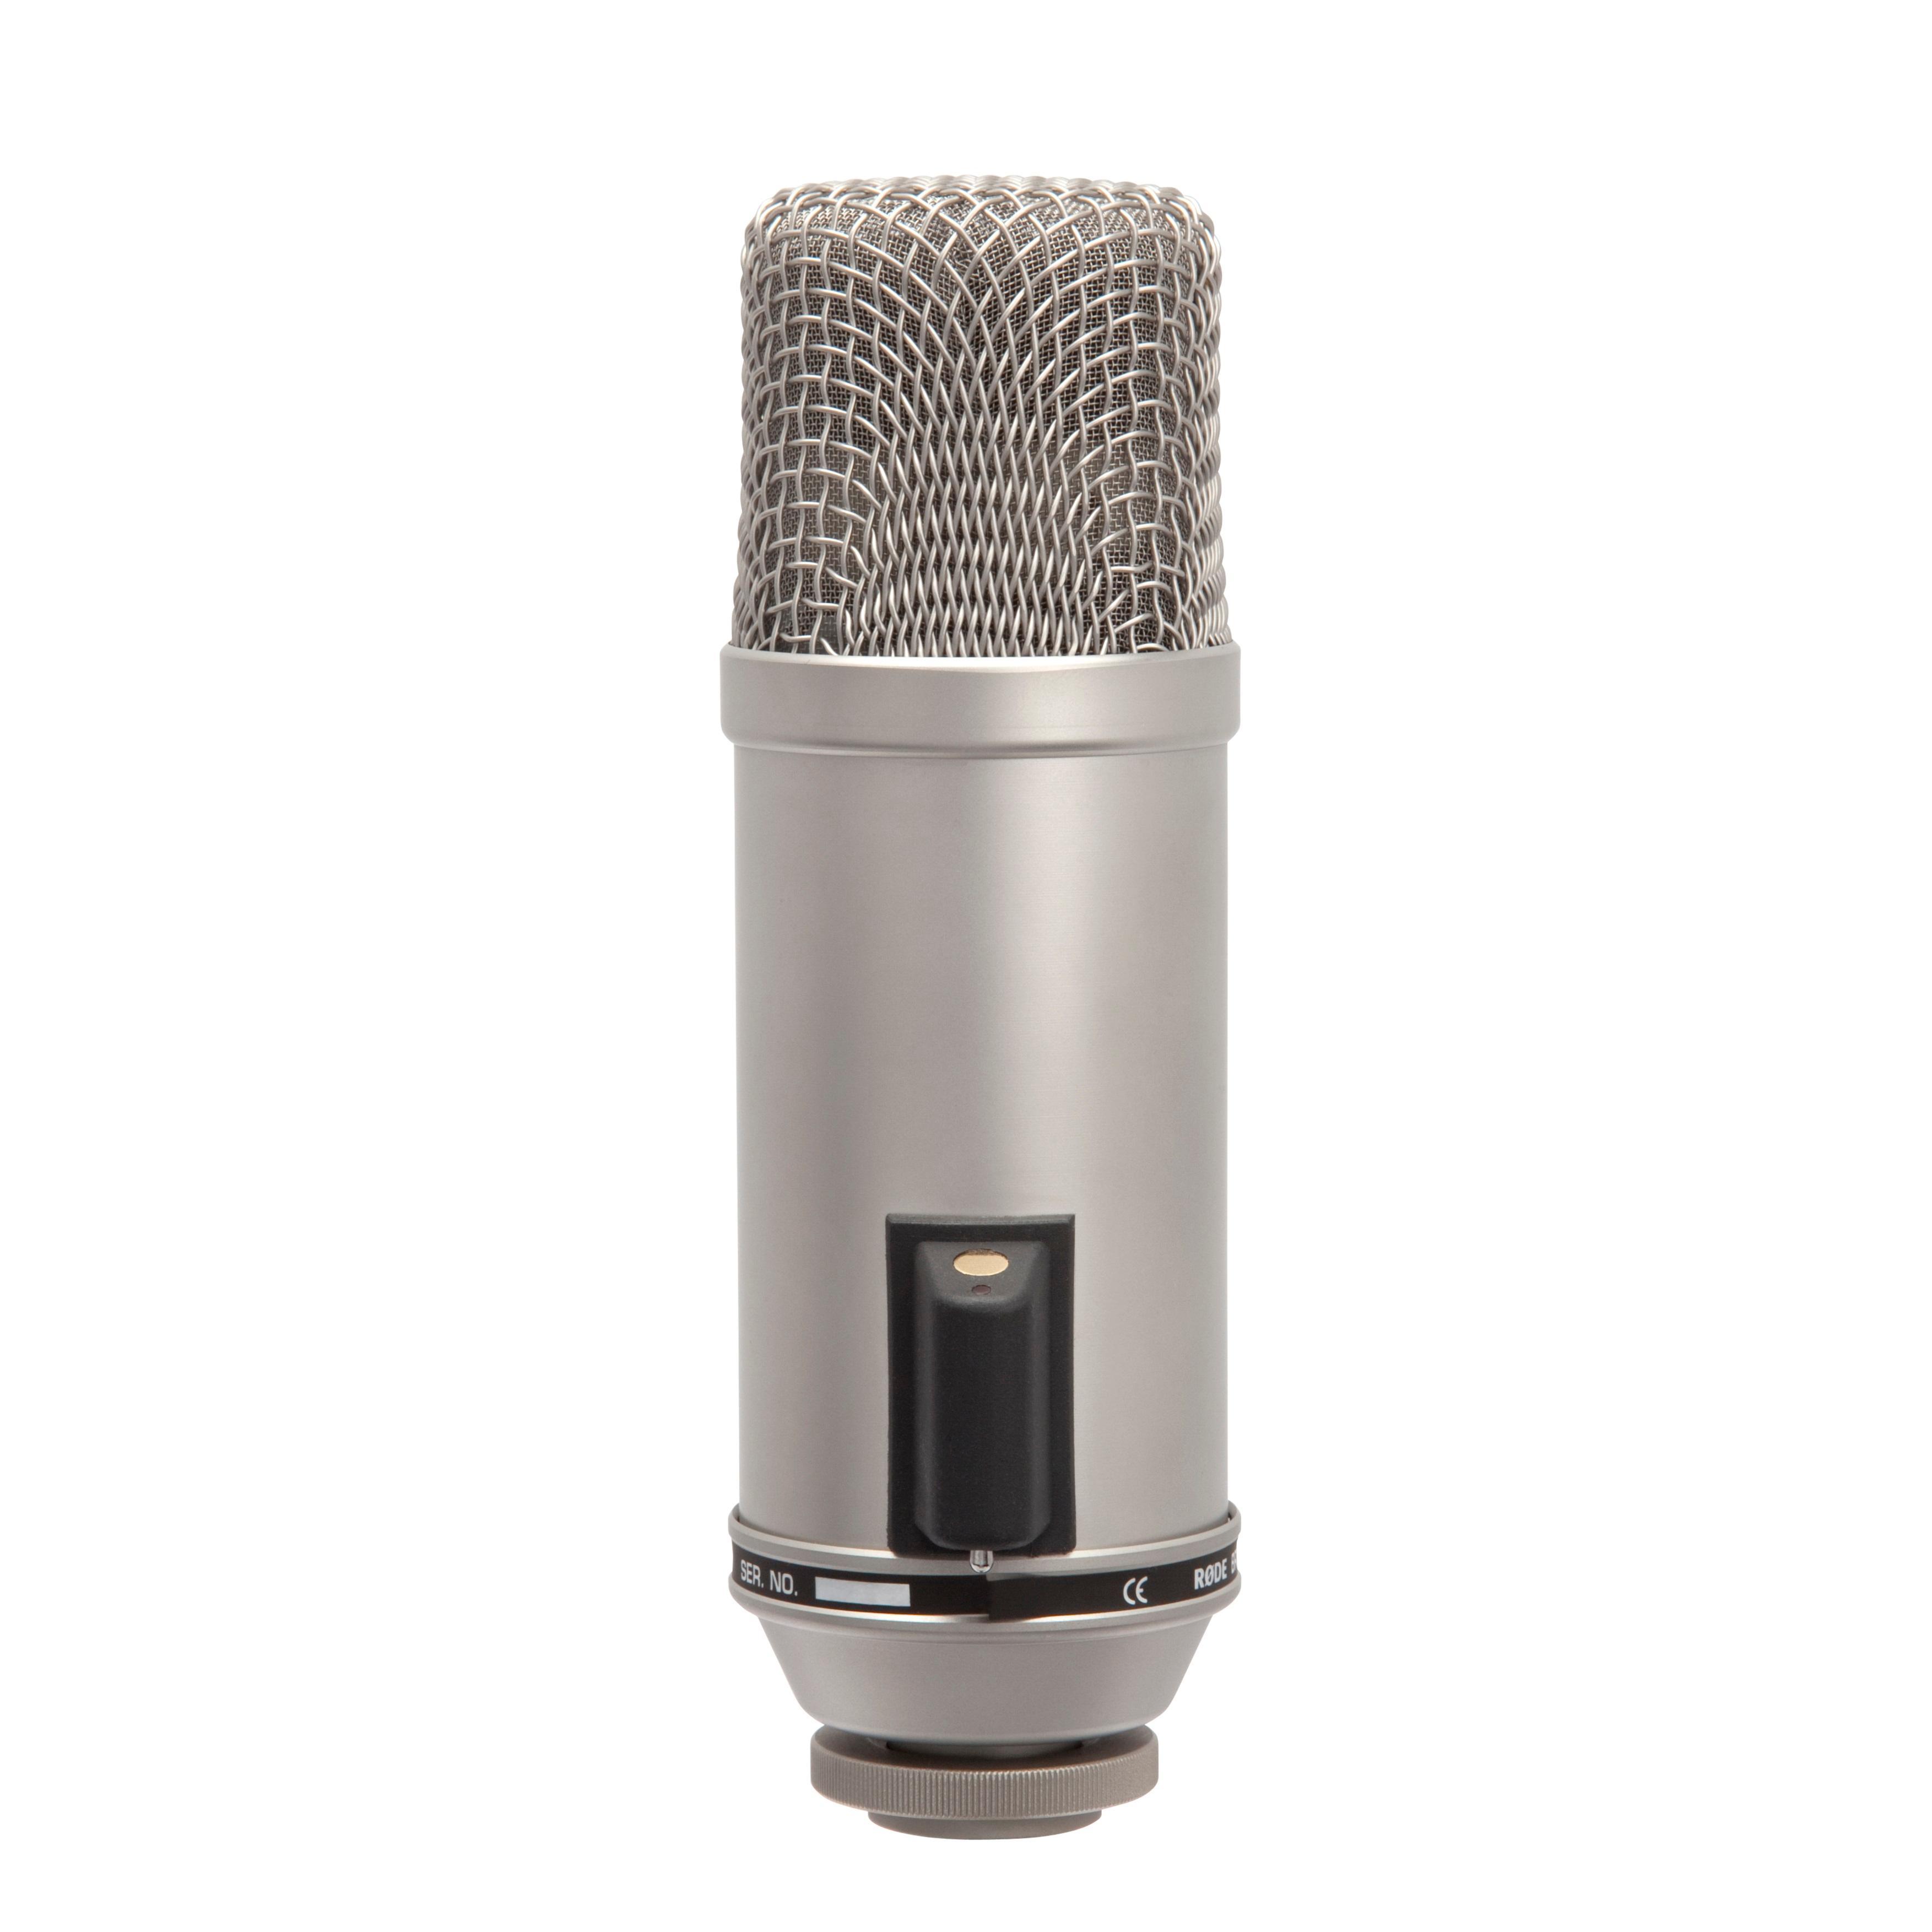 Amazon.com: Rode Broadcaster Studio Condenser Microphone ...